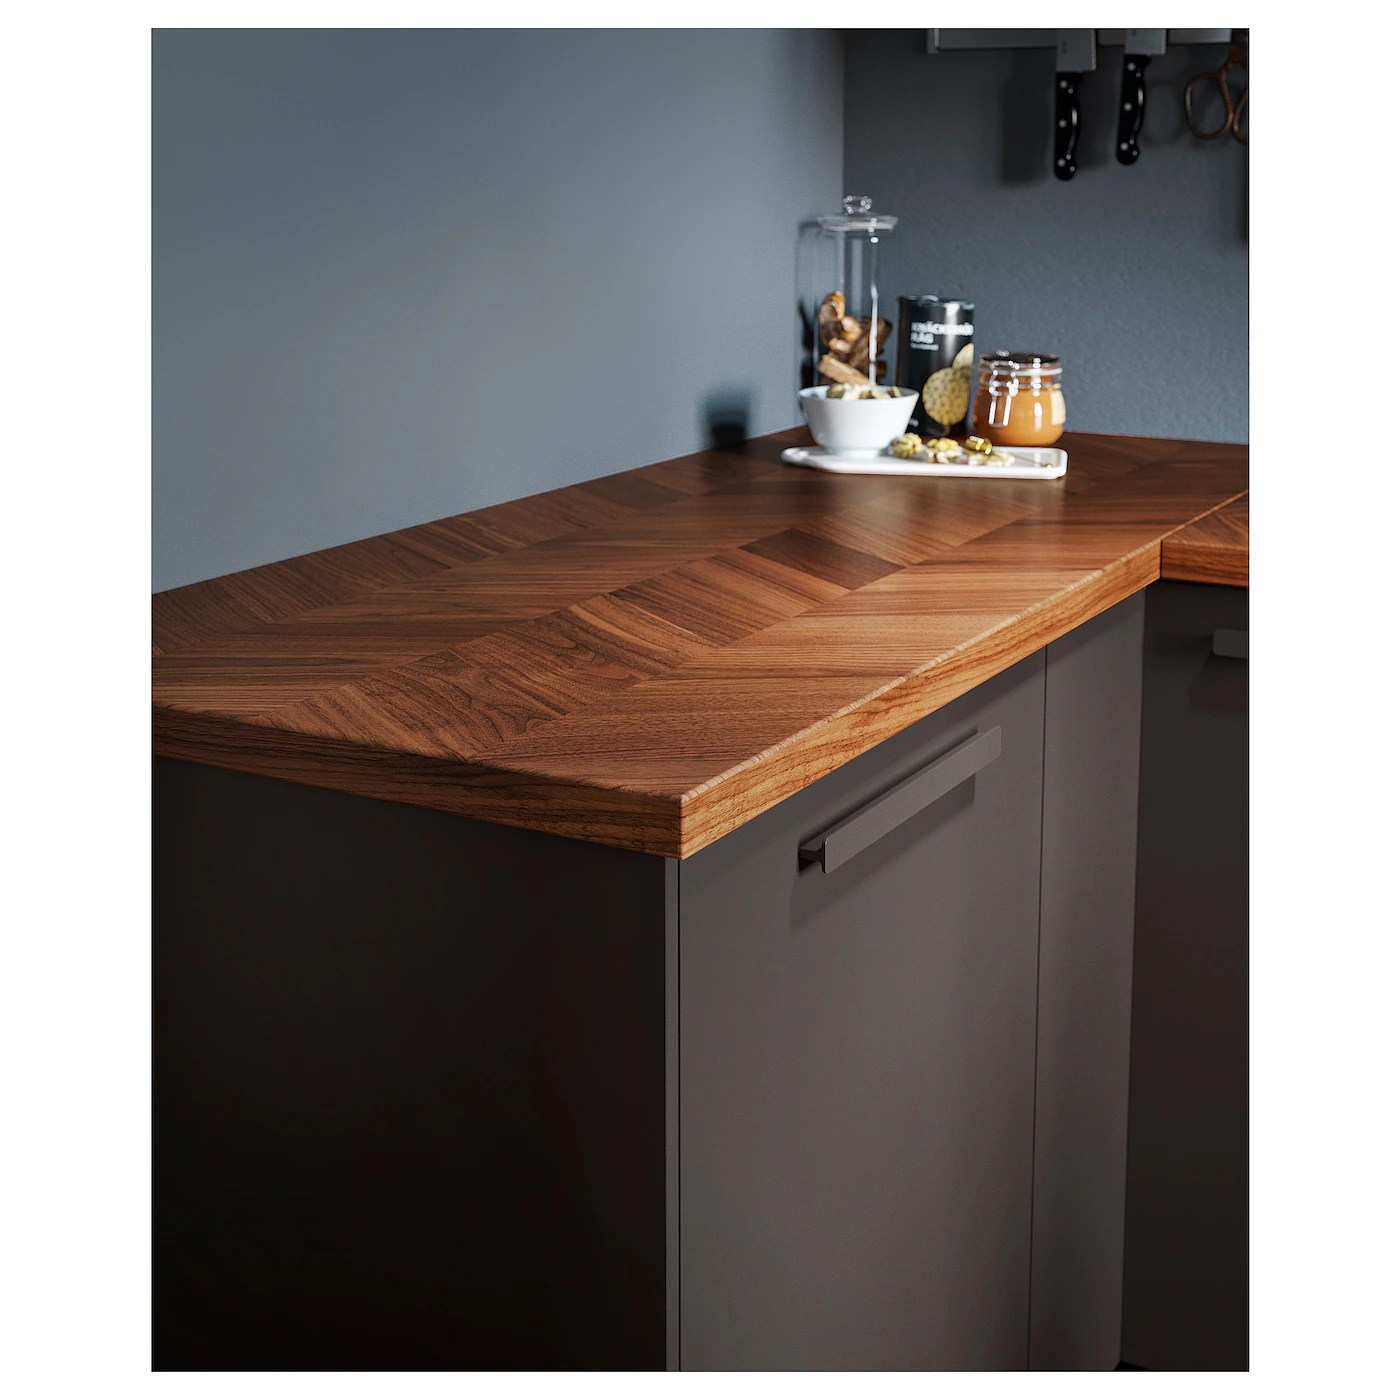 Barkaboda Worktop Walnut Veneer 186x3 8 Cm Ikea